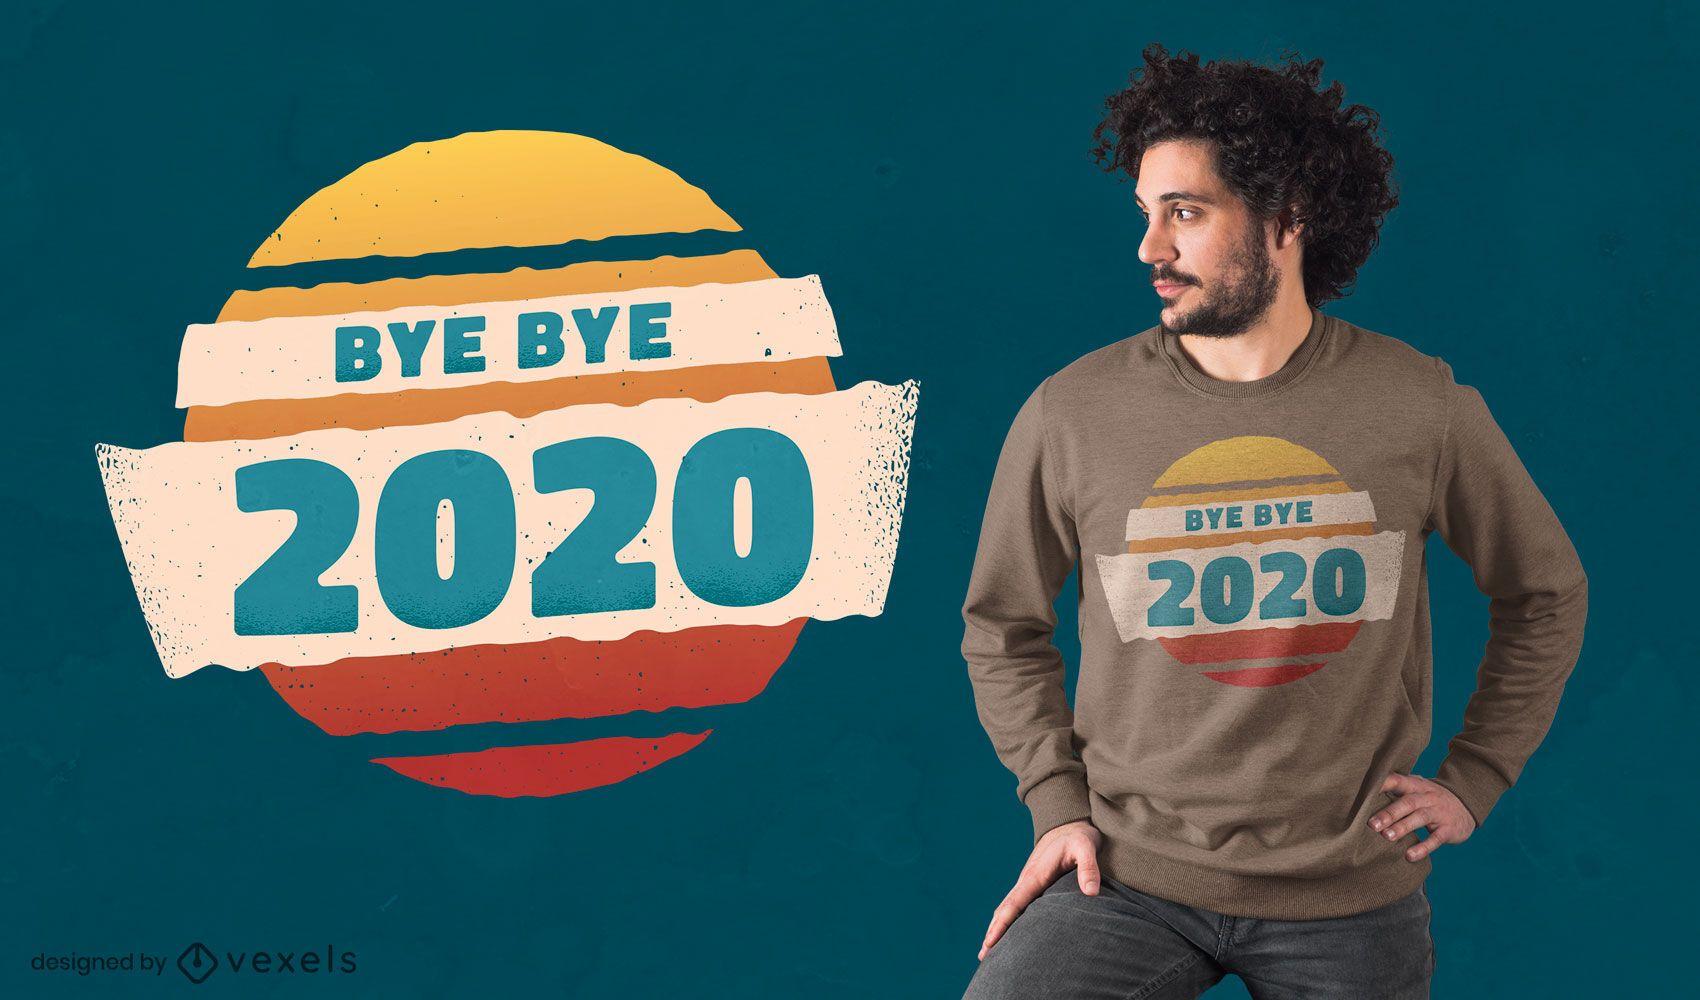 Bye bye 2020 t-shirt design